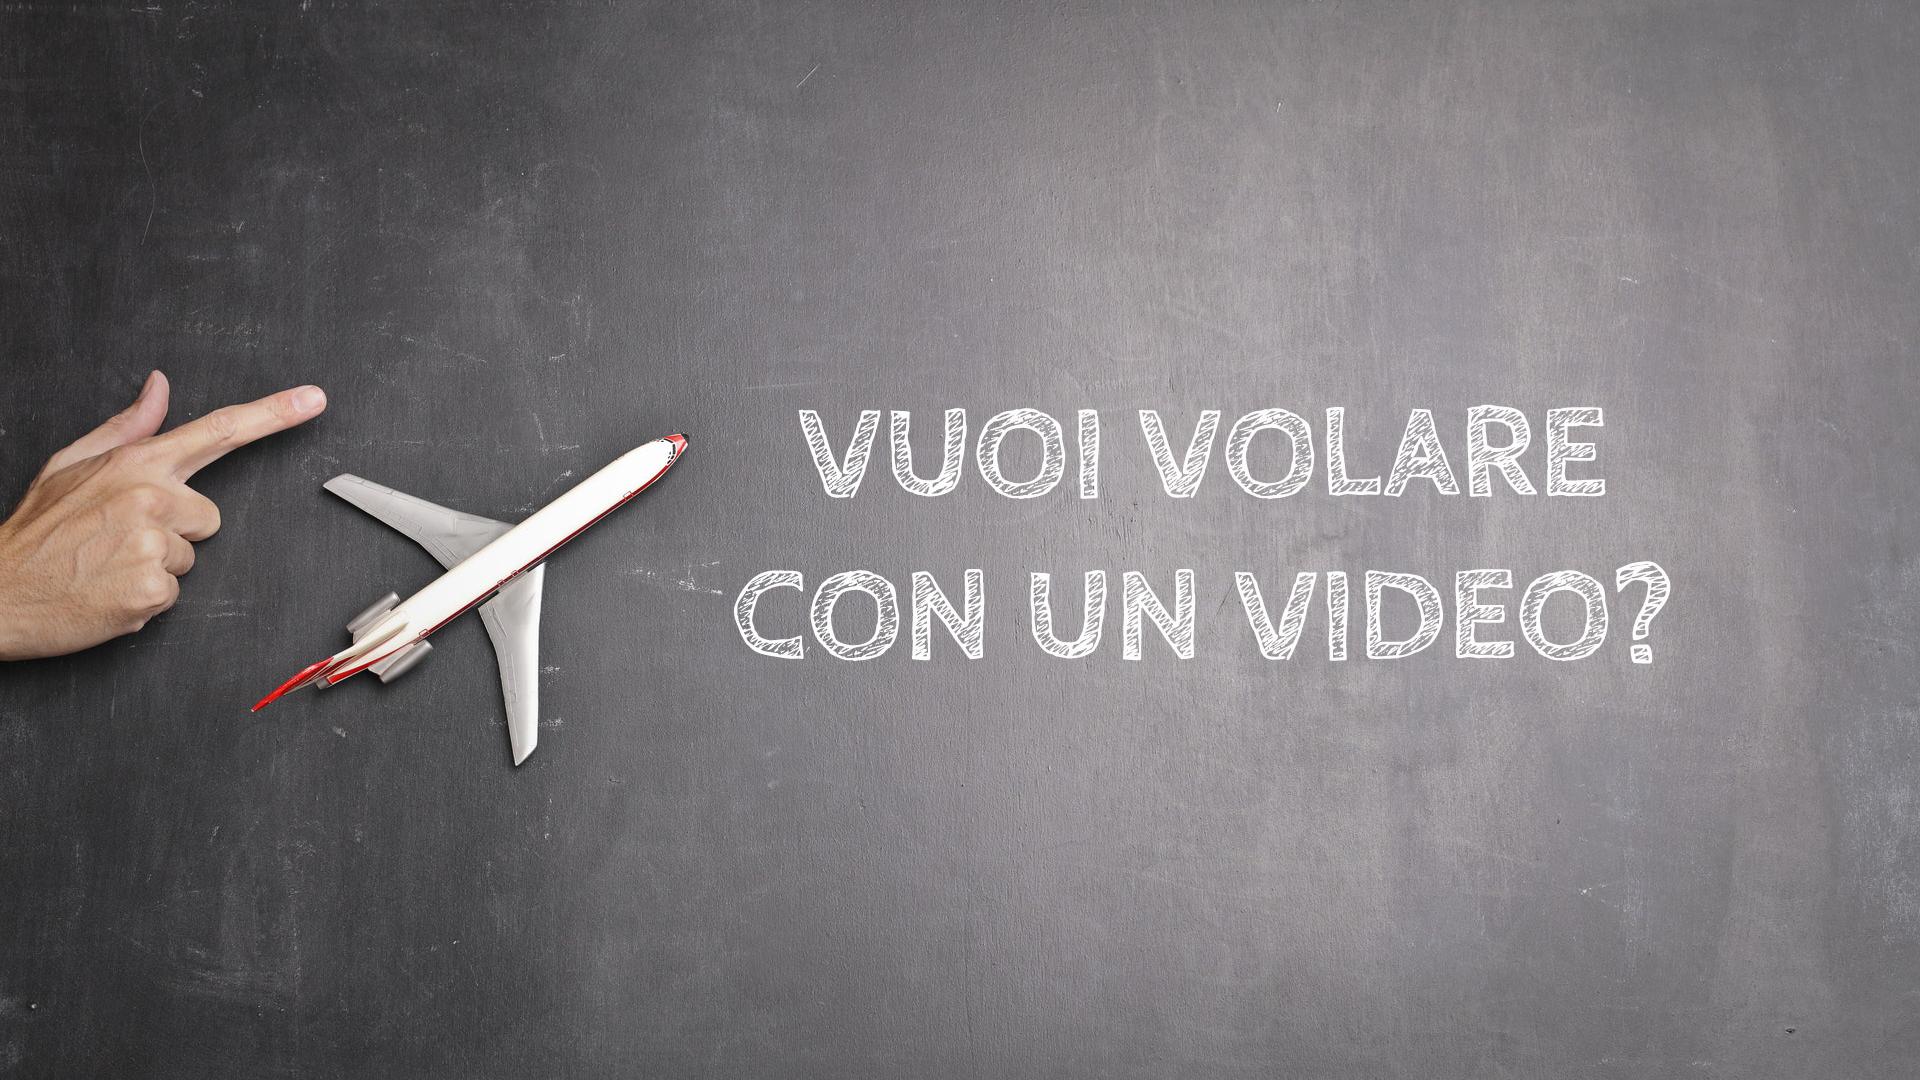 https://ram-consulting.org/wp-content/uploads/2020/10/vola-con-un-video.jpg